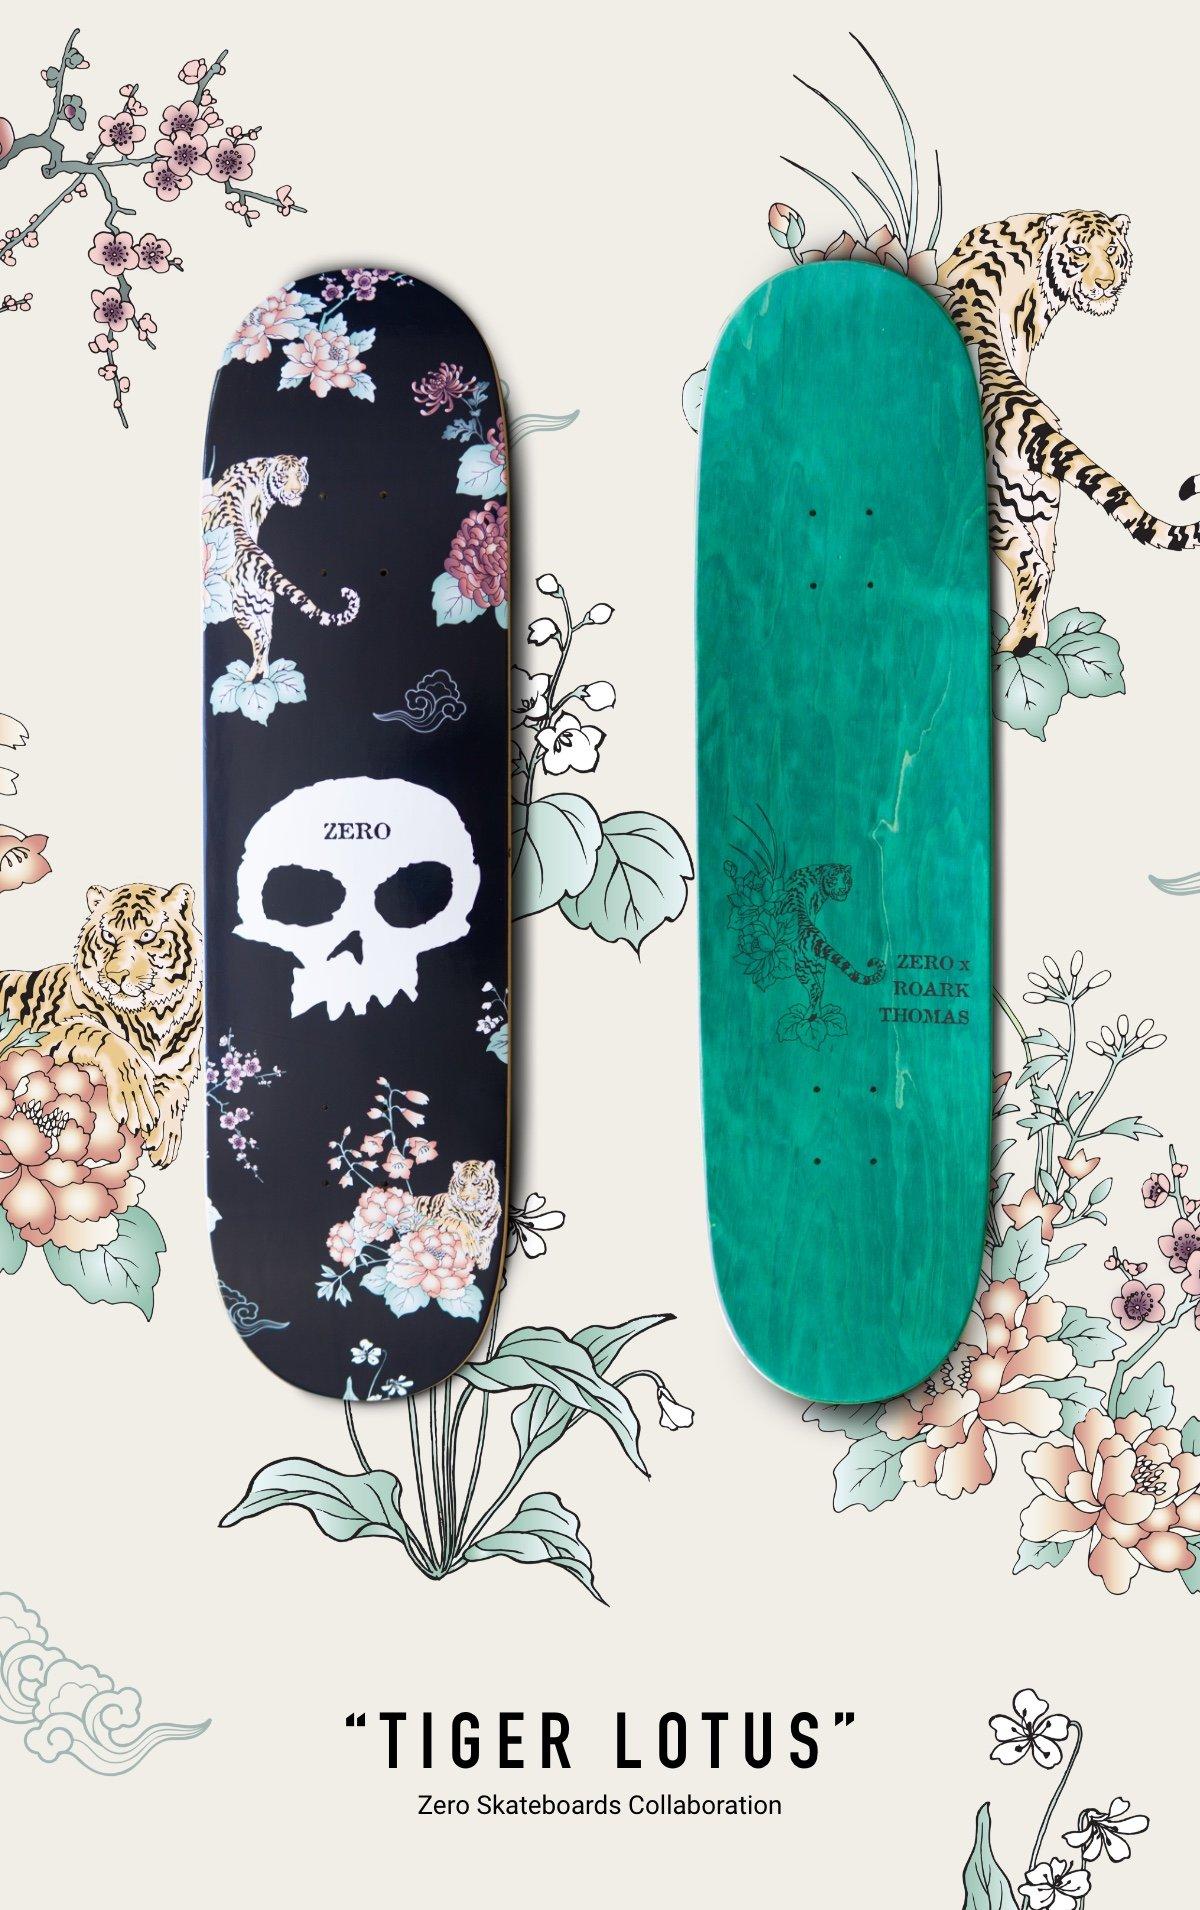 """TIGER LOTUS"" Zero Skateboards Collaboration"